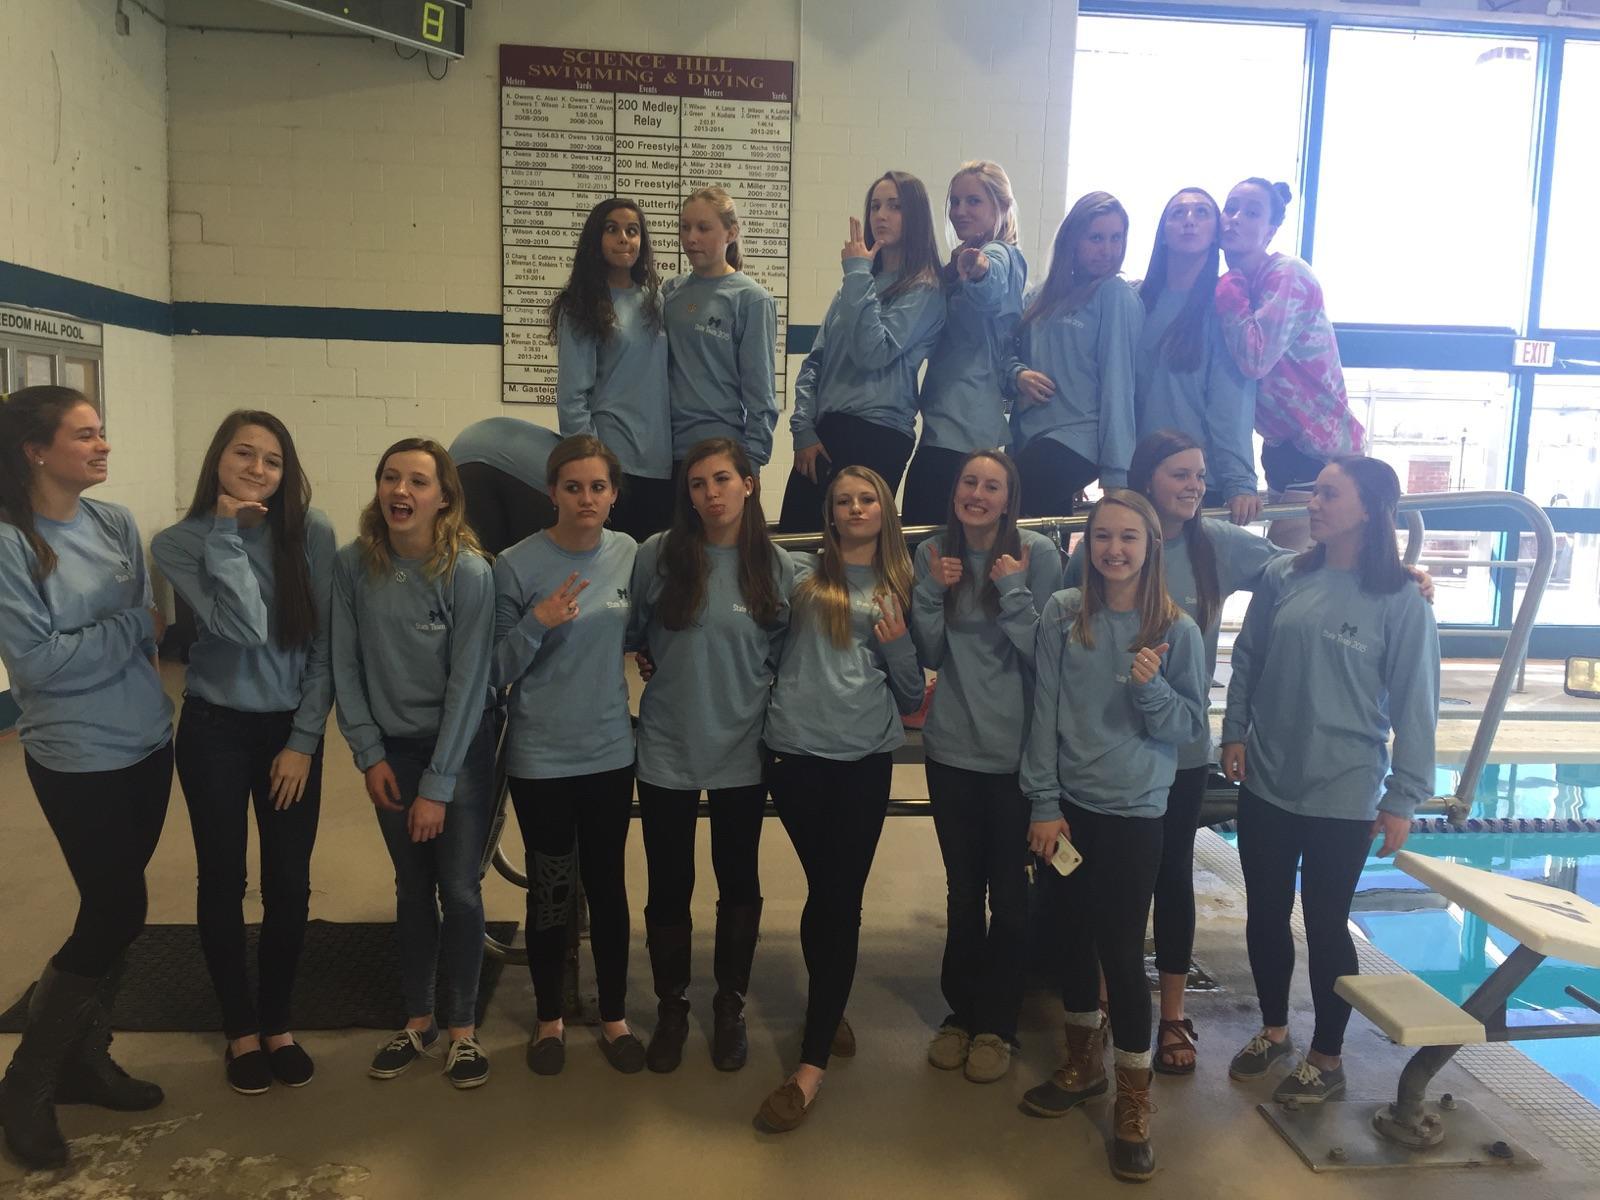 Shirt design for girl 2015 - Shhs Girls State Team 2015 T Shirt Photo